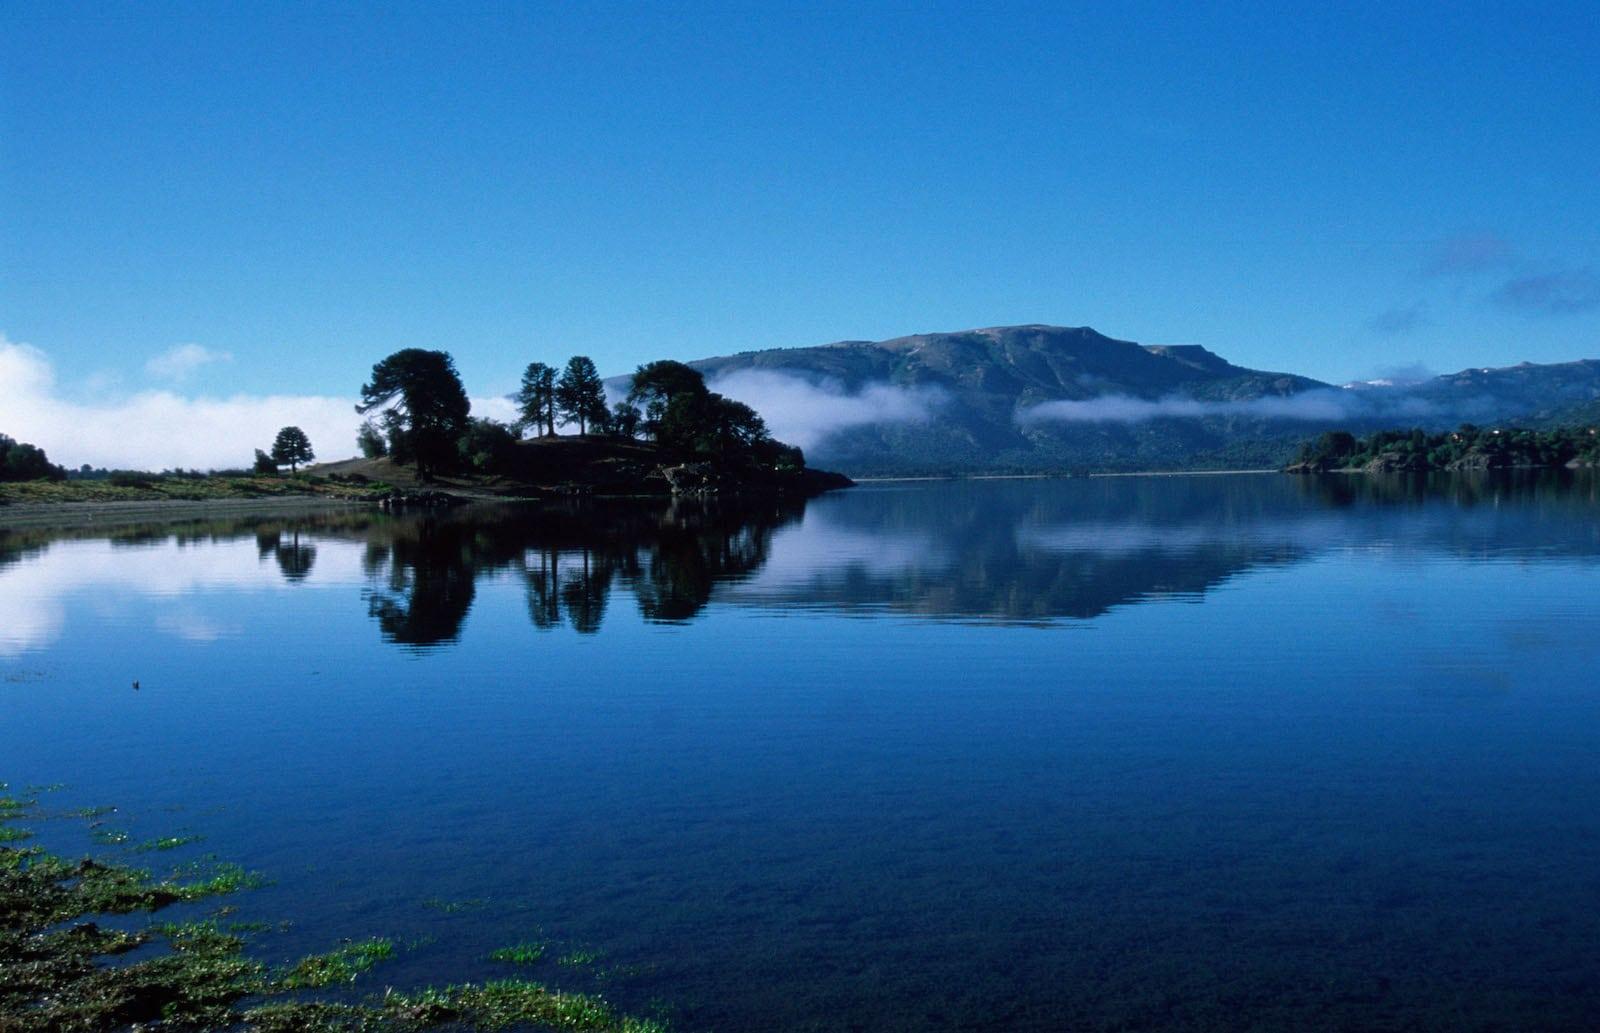 Lago Alumine, Argentina. 485 kms